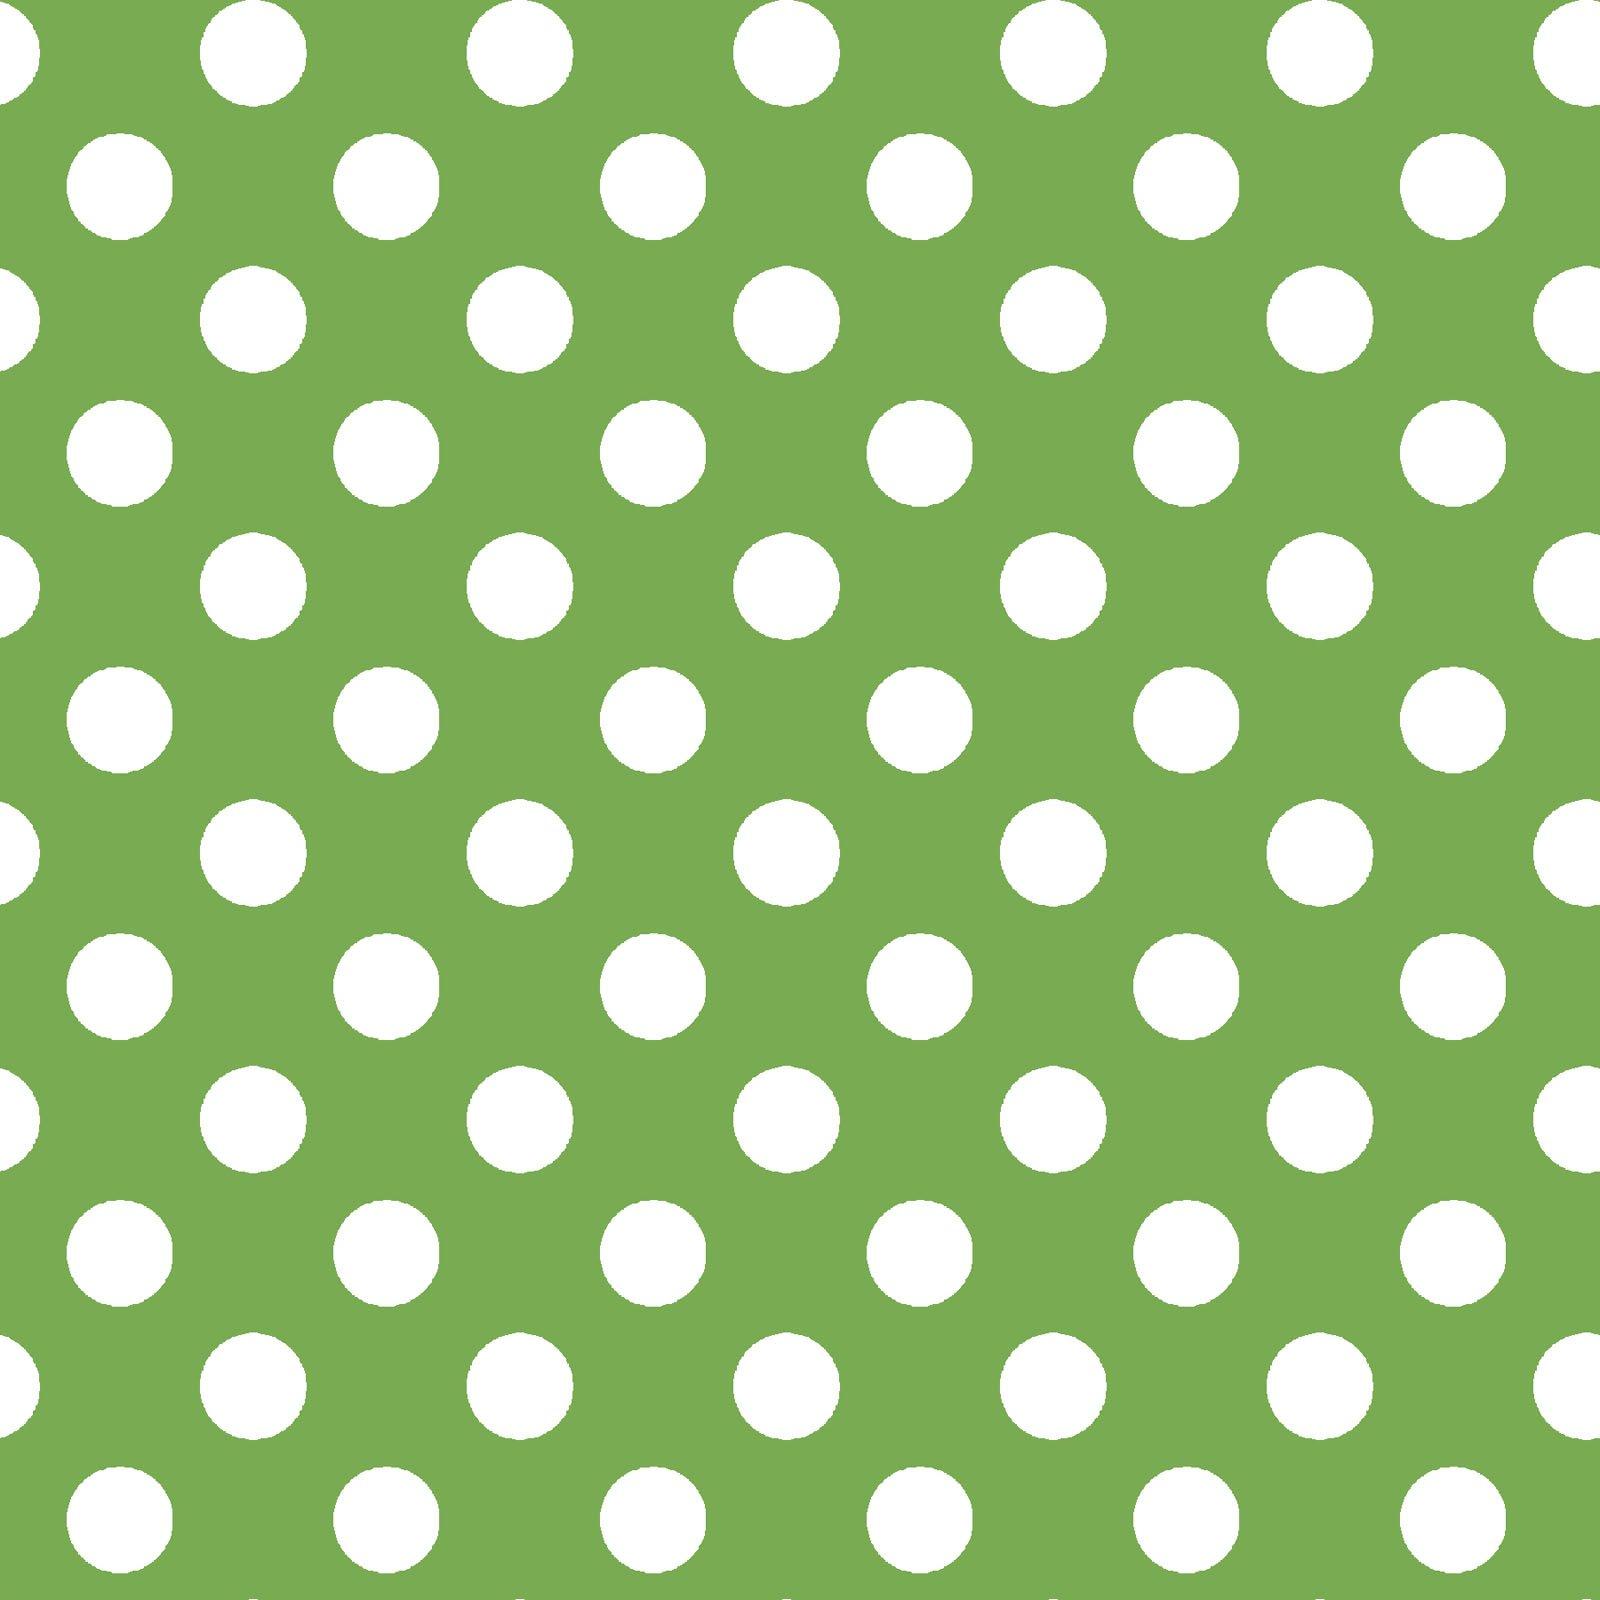 KimberBell Basics Green Dots 8216M-G